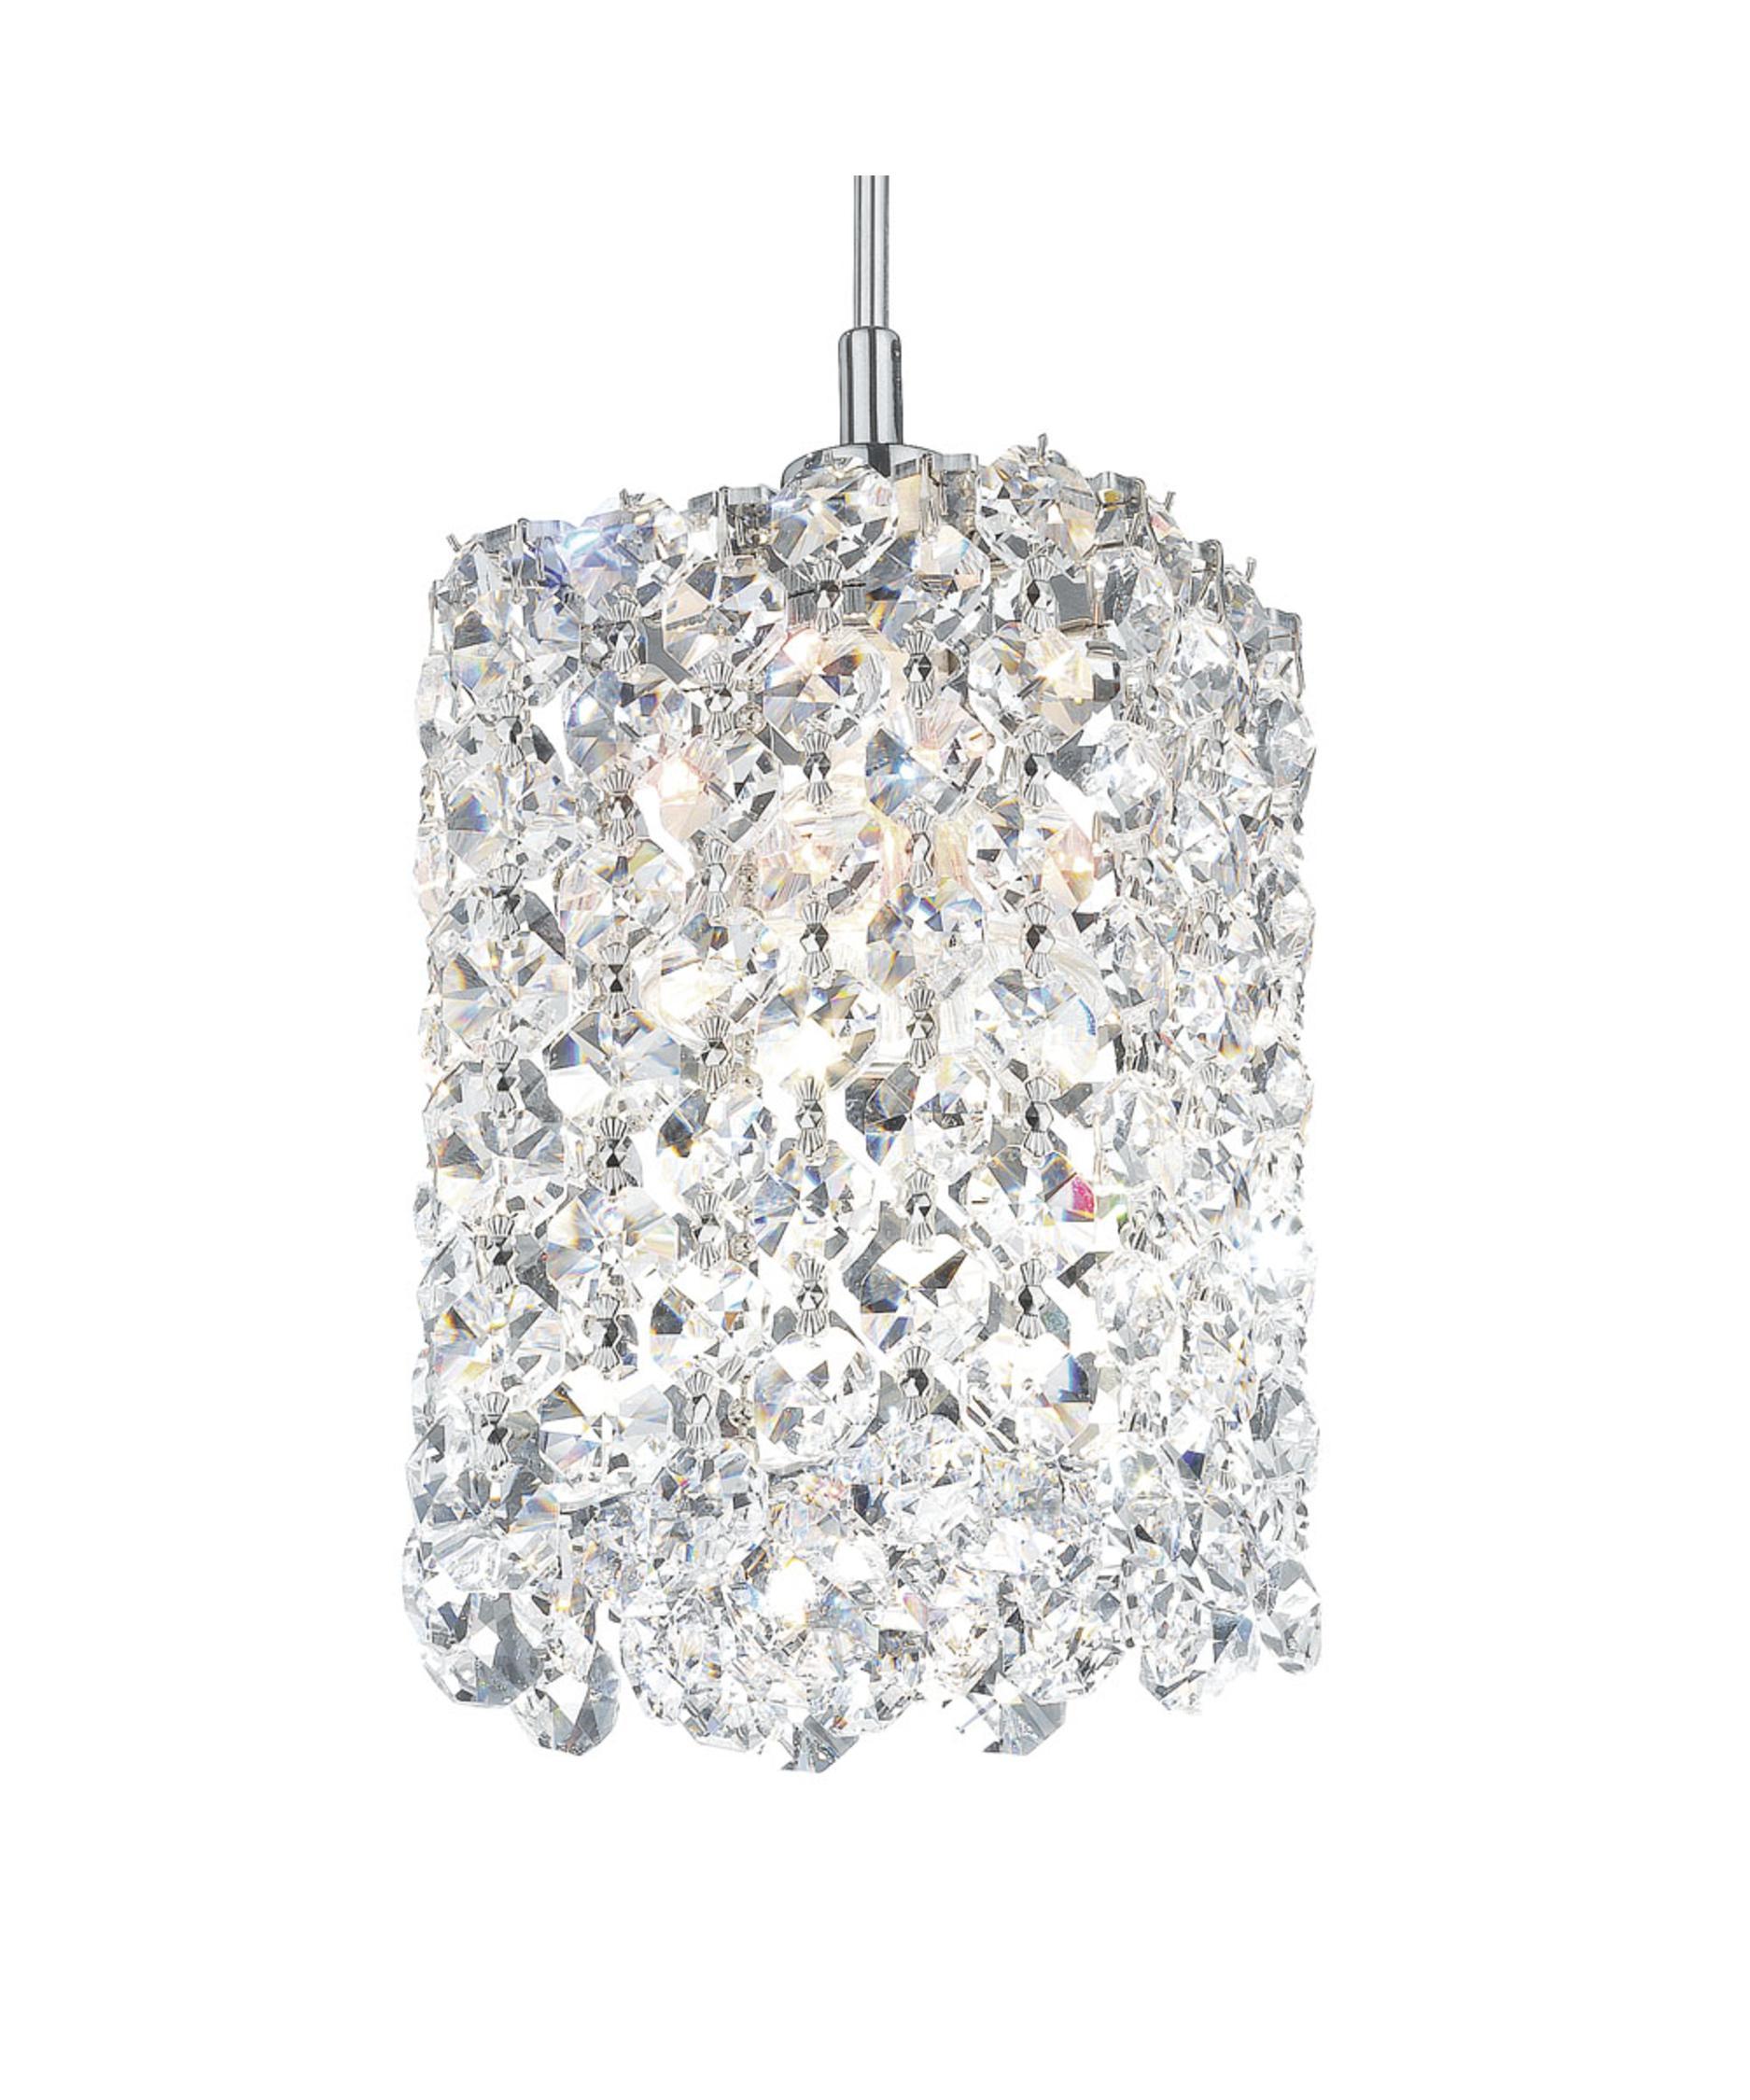 geometrix by schonbek re0405 refrax 4 inch wide 1 light mini pendant capitol lighting - Schonbek